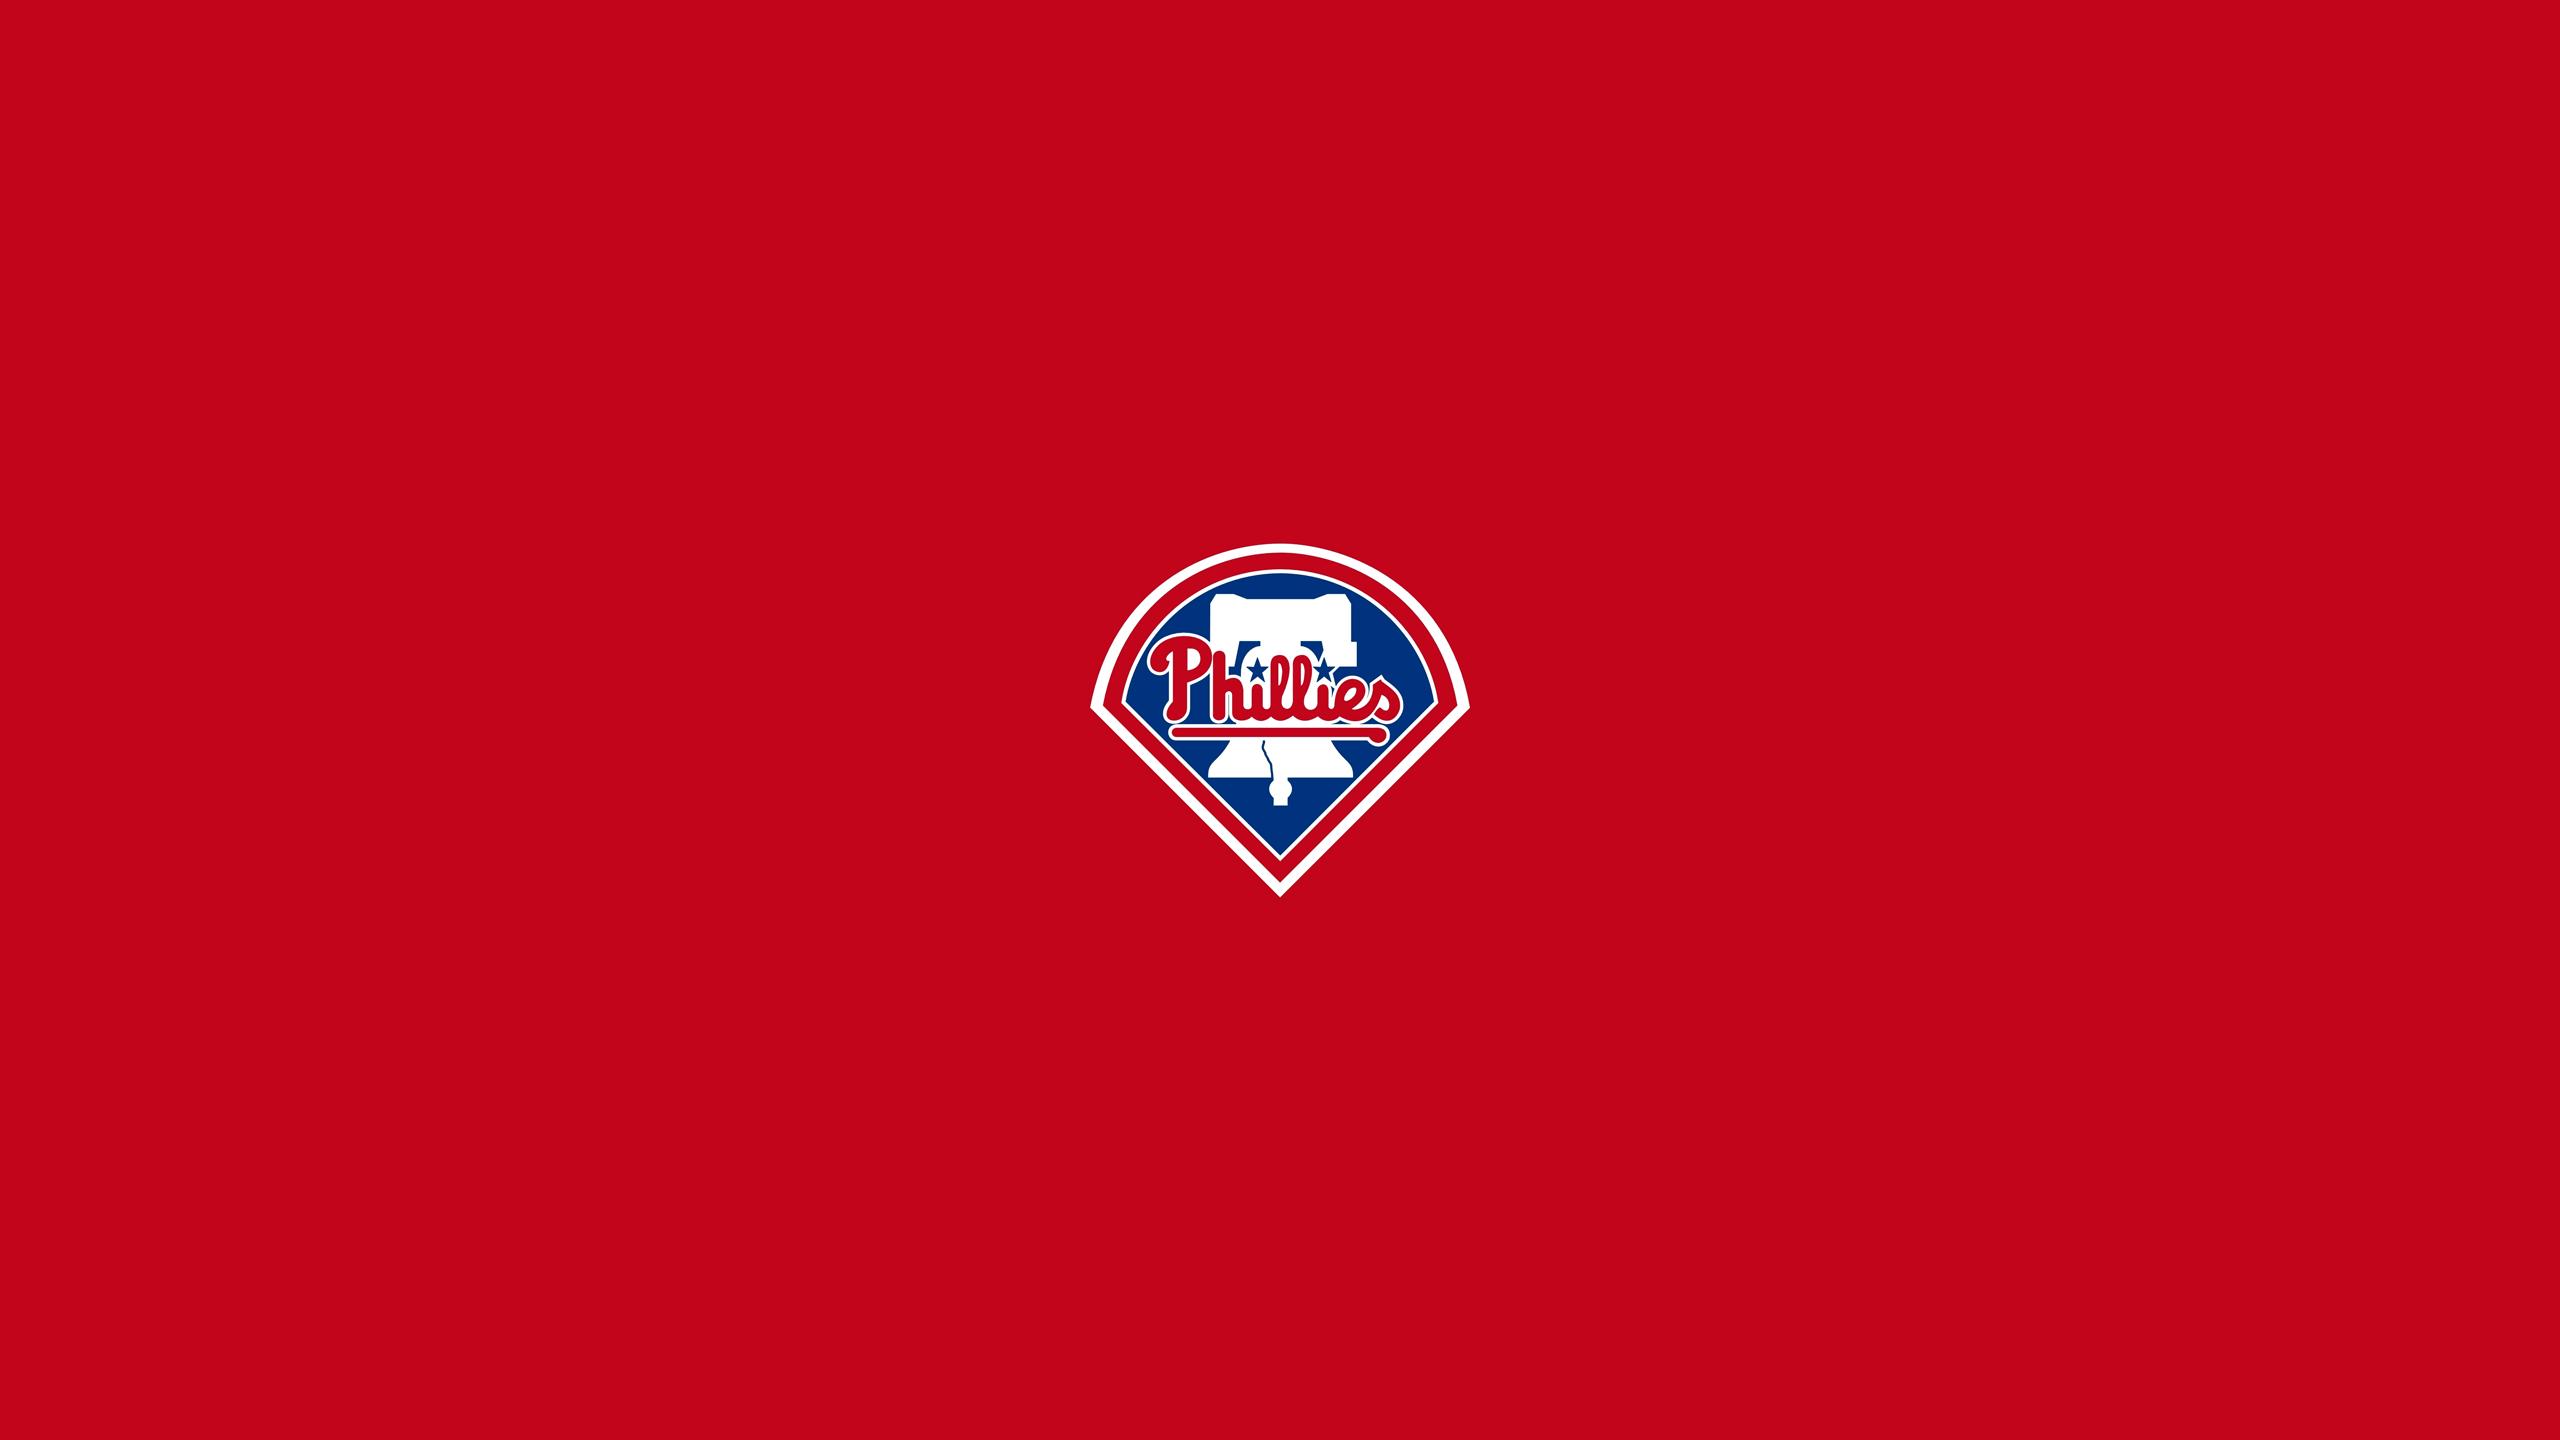 Phillies Iphone Wallpaper Phillies Wallpaper 2560x1440 54136